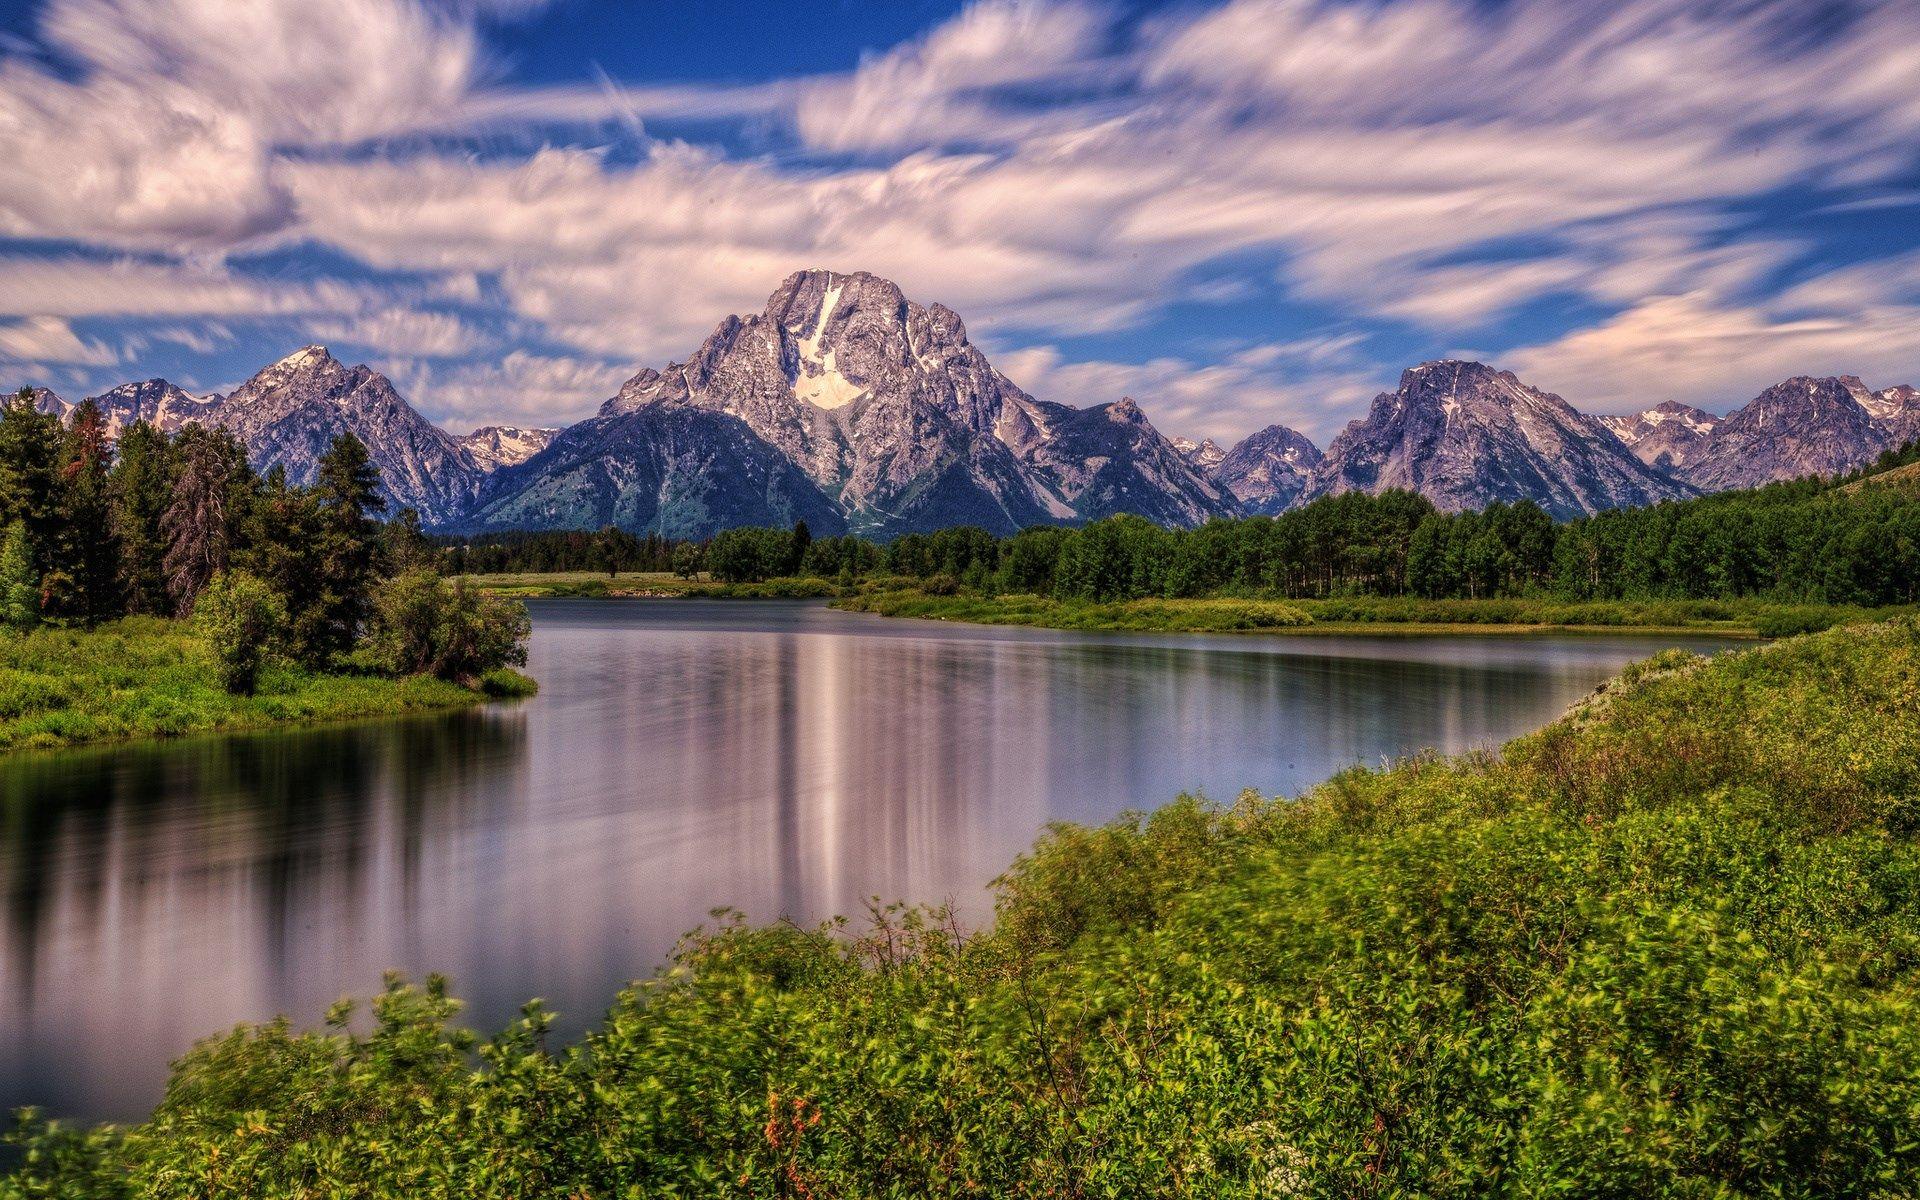 Hd Wallpaper Of Natures 1920x1200 Grand Tetons Grand Teton National Park National Parks Wyoming